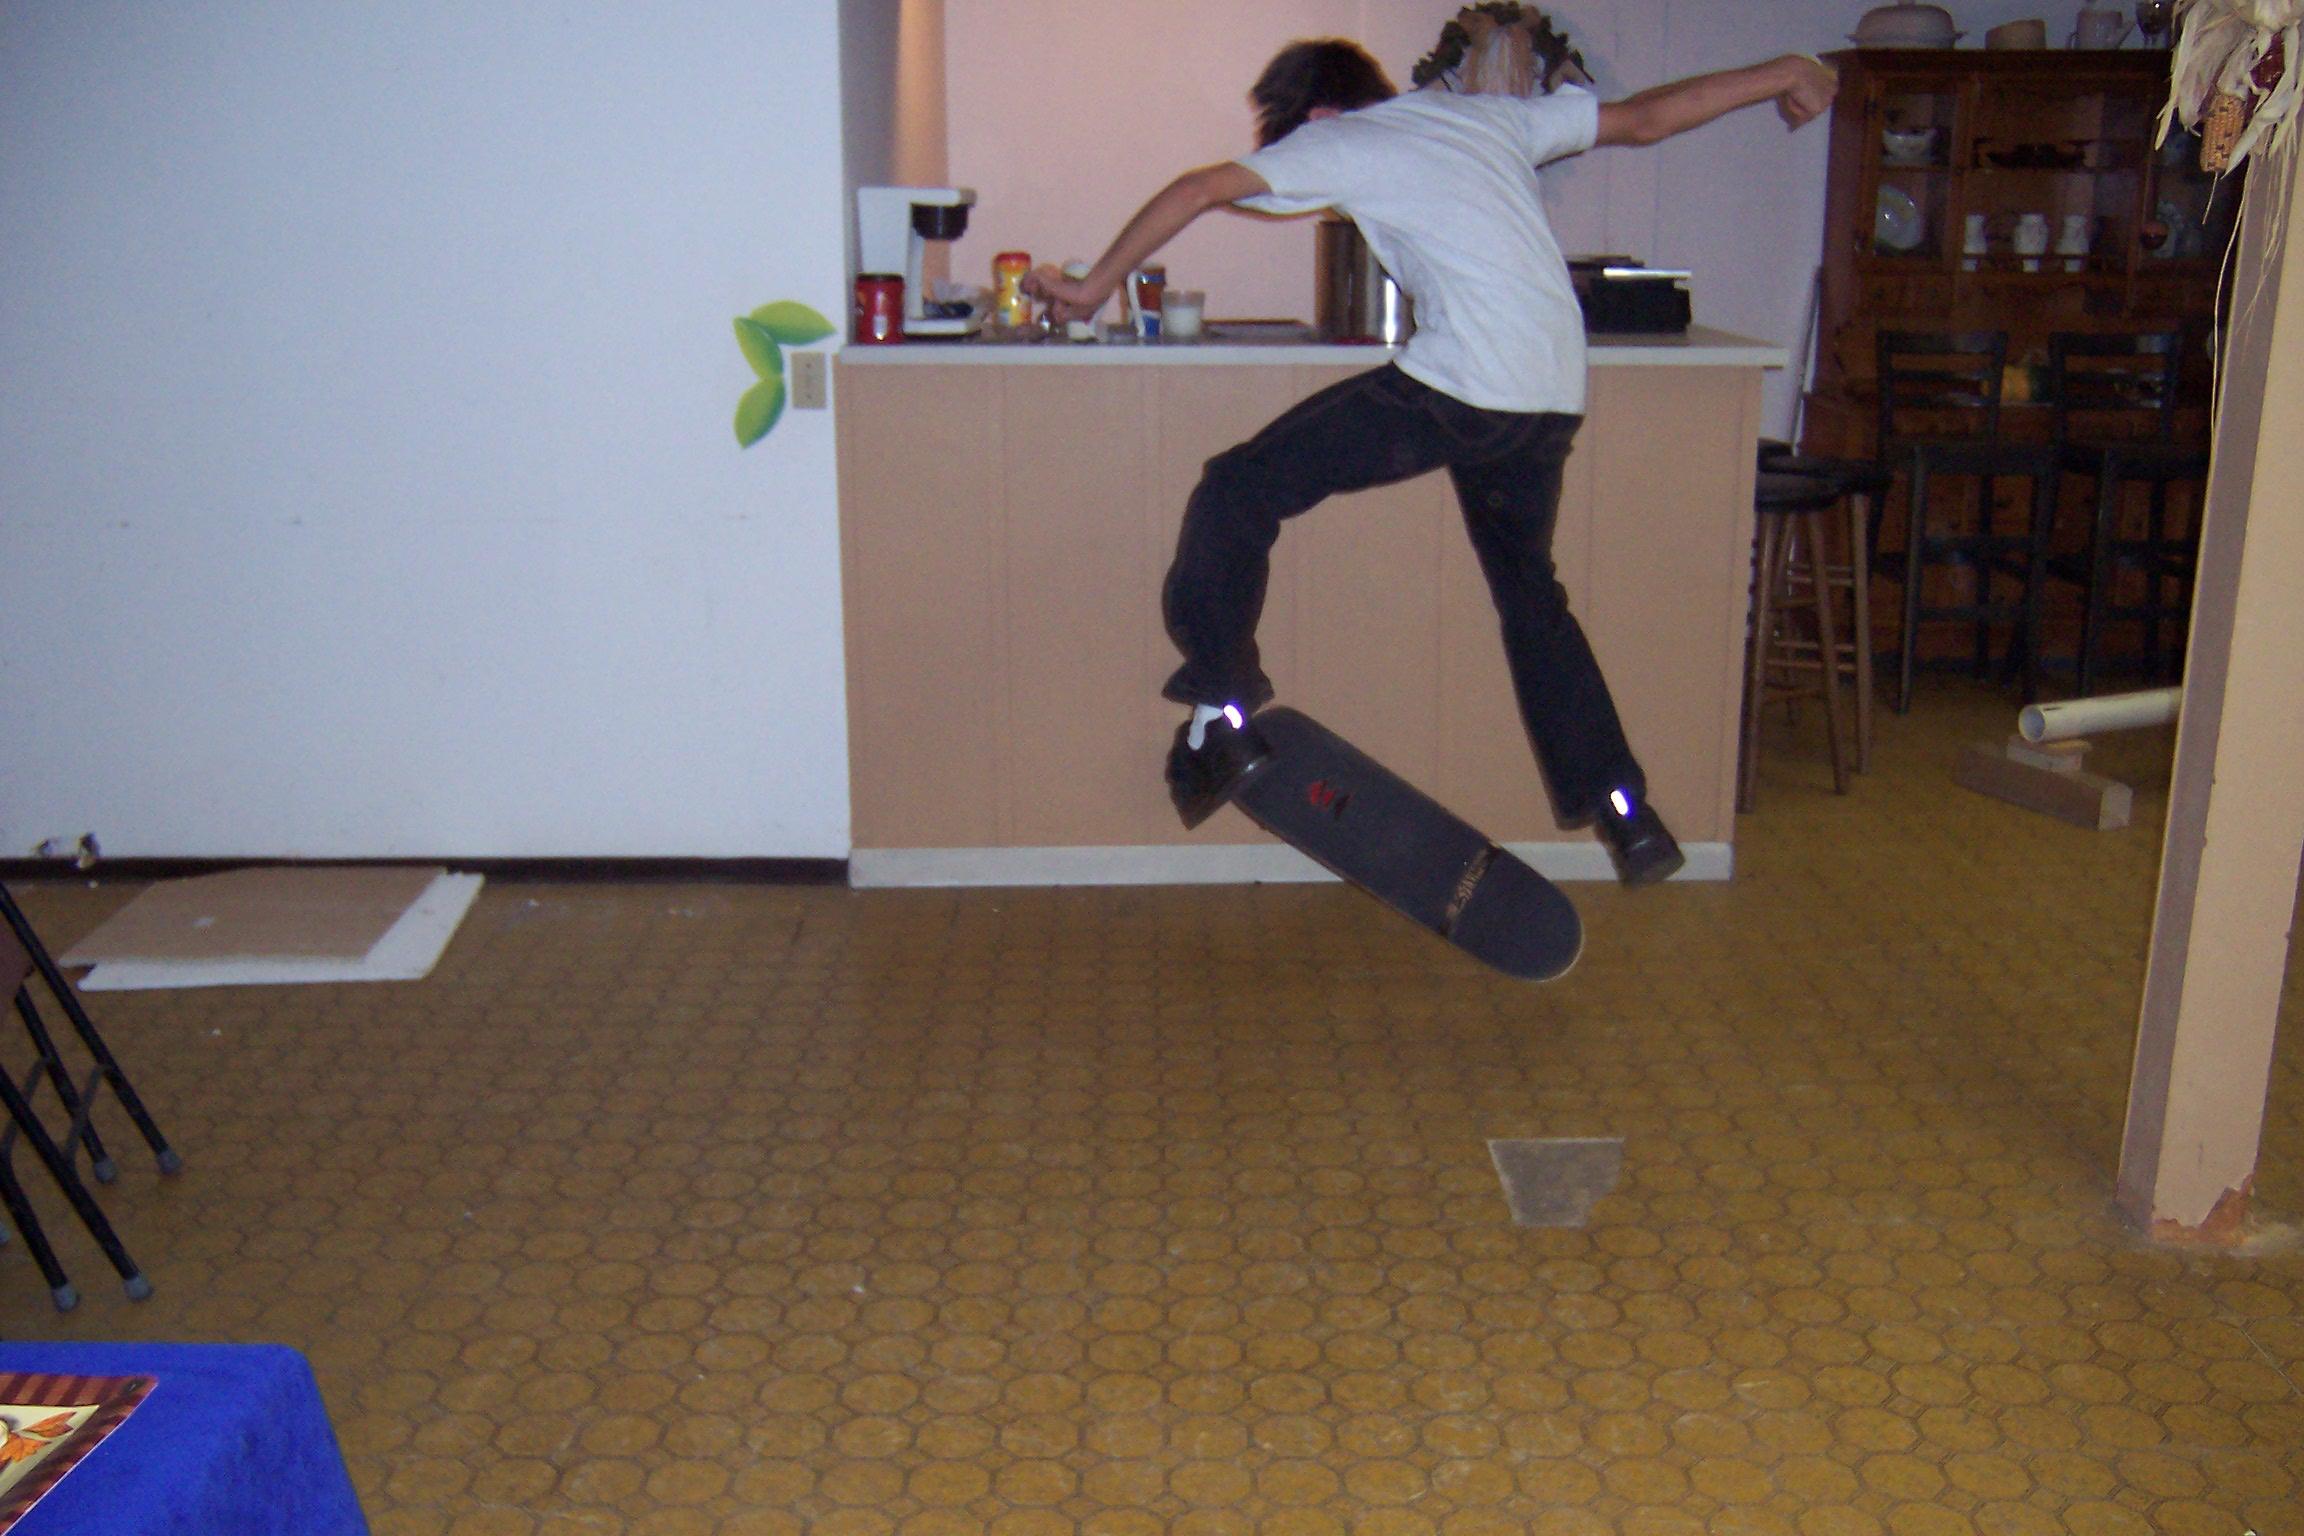 Skateboarding: Setup and Styles